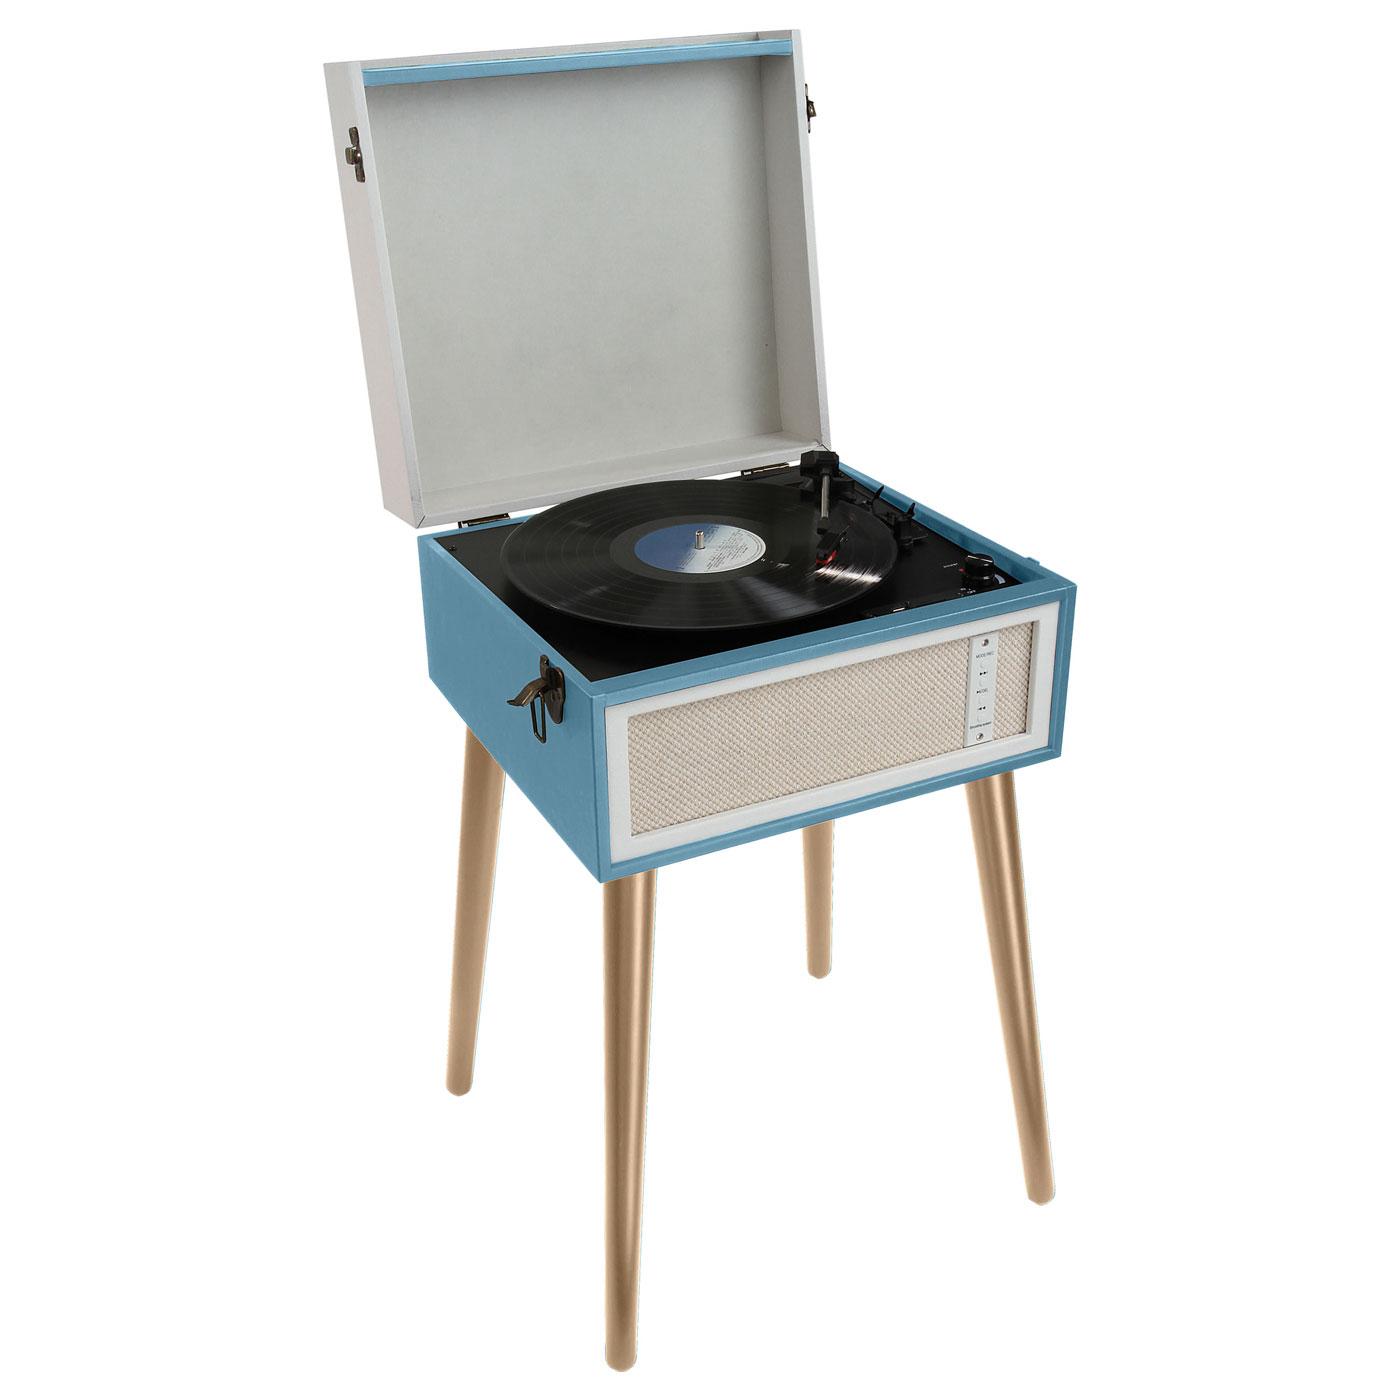 clipsonic tes190 bleu platine vinyle clipsonic sur. Black Bedroom Furniture Sets. Home Design Ideas